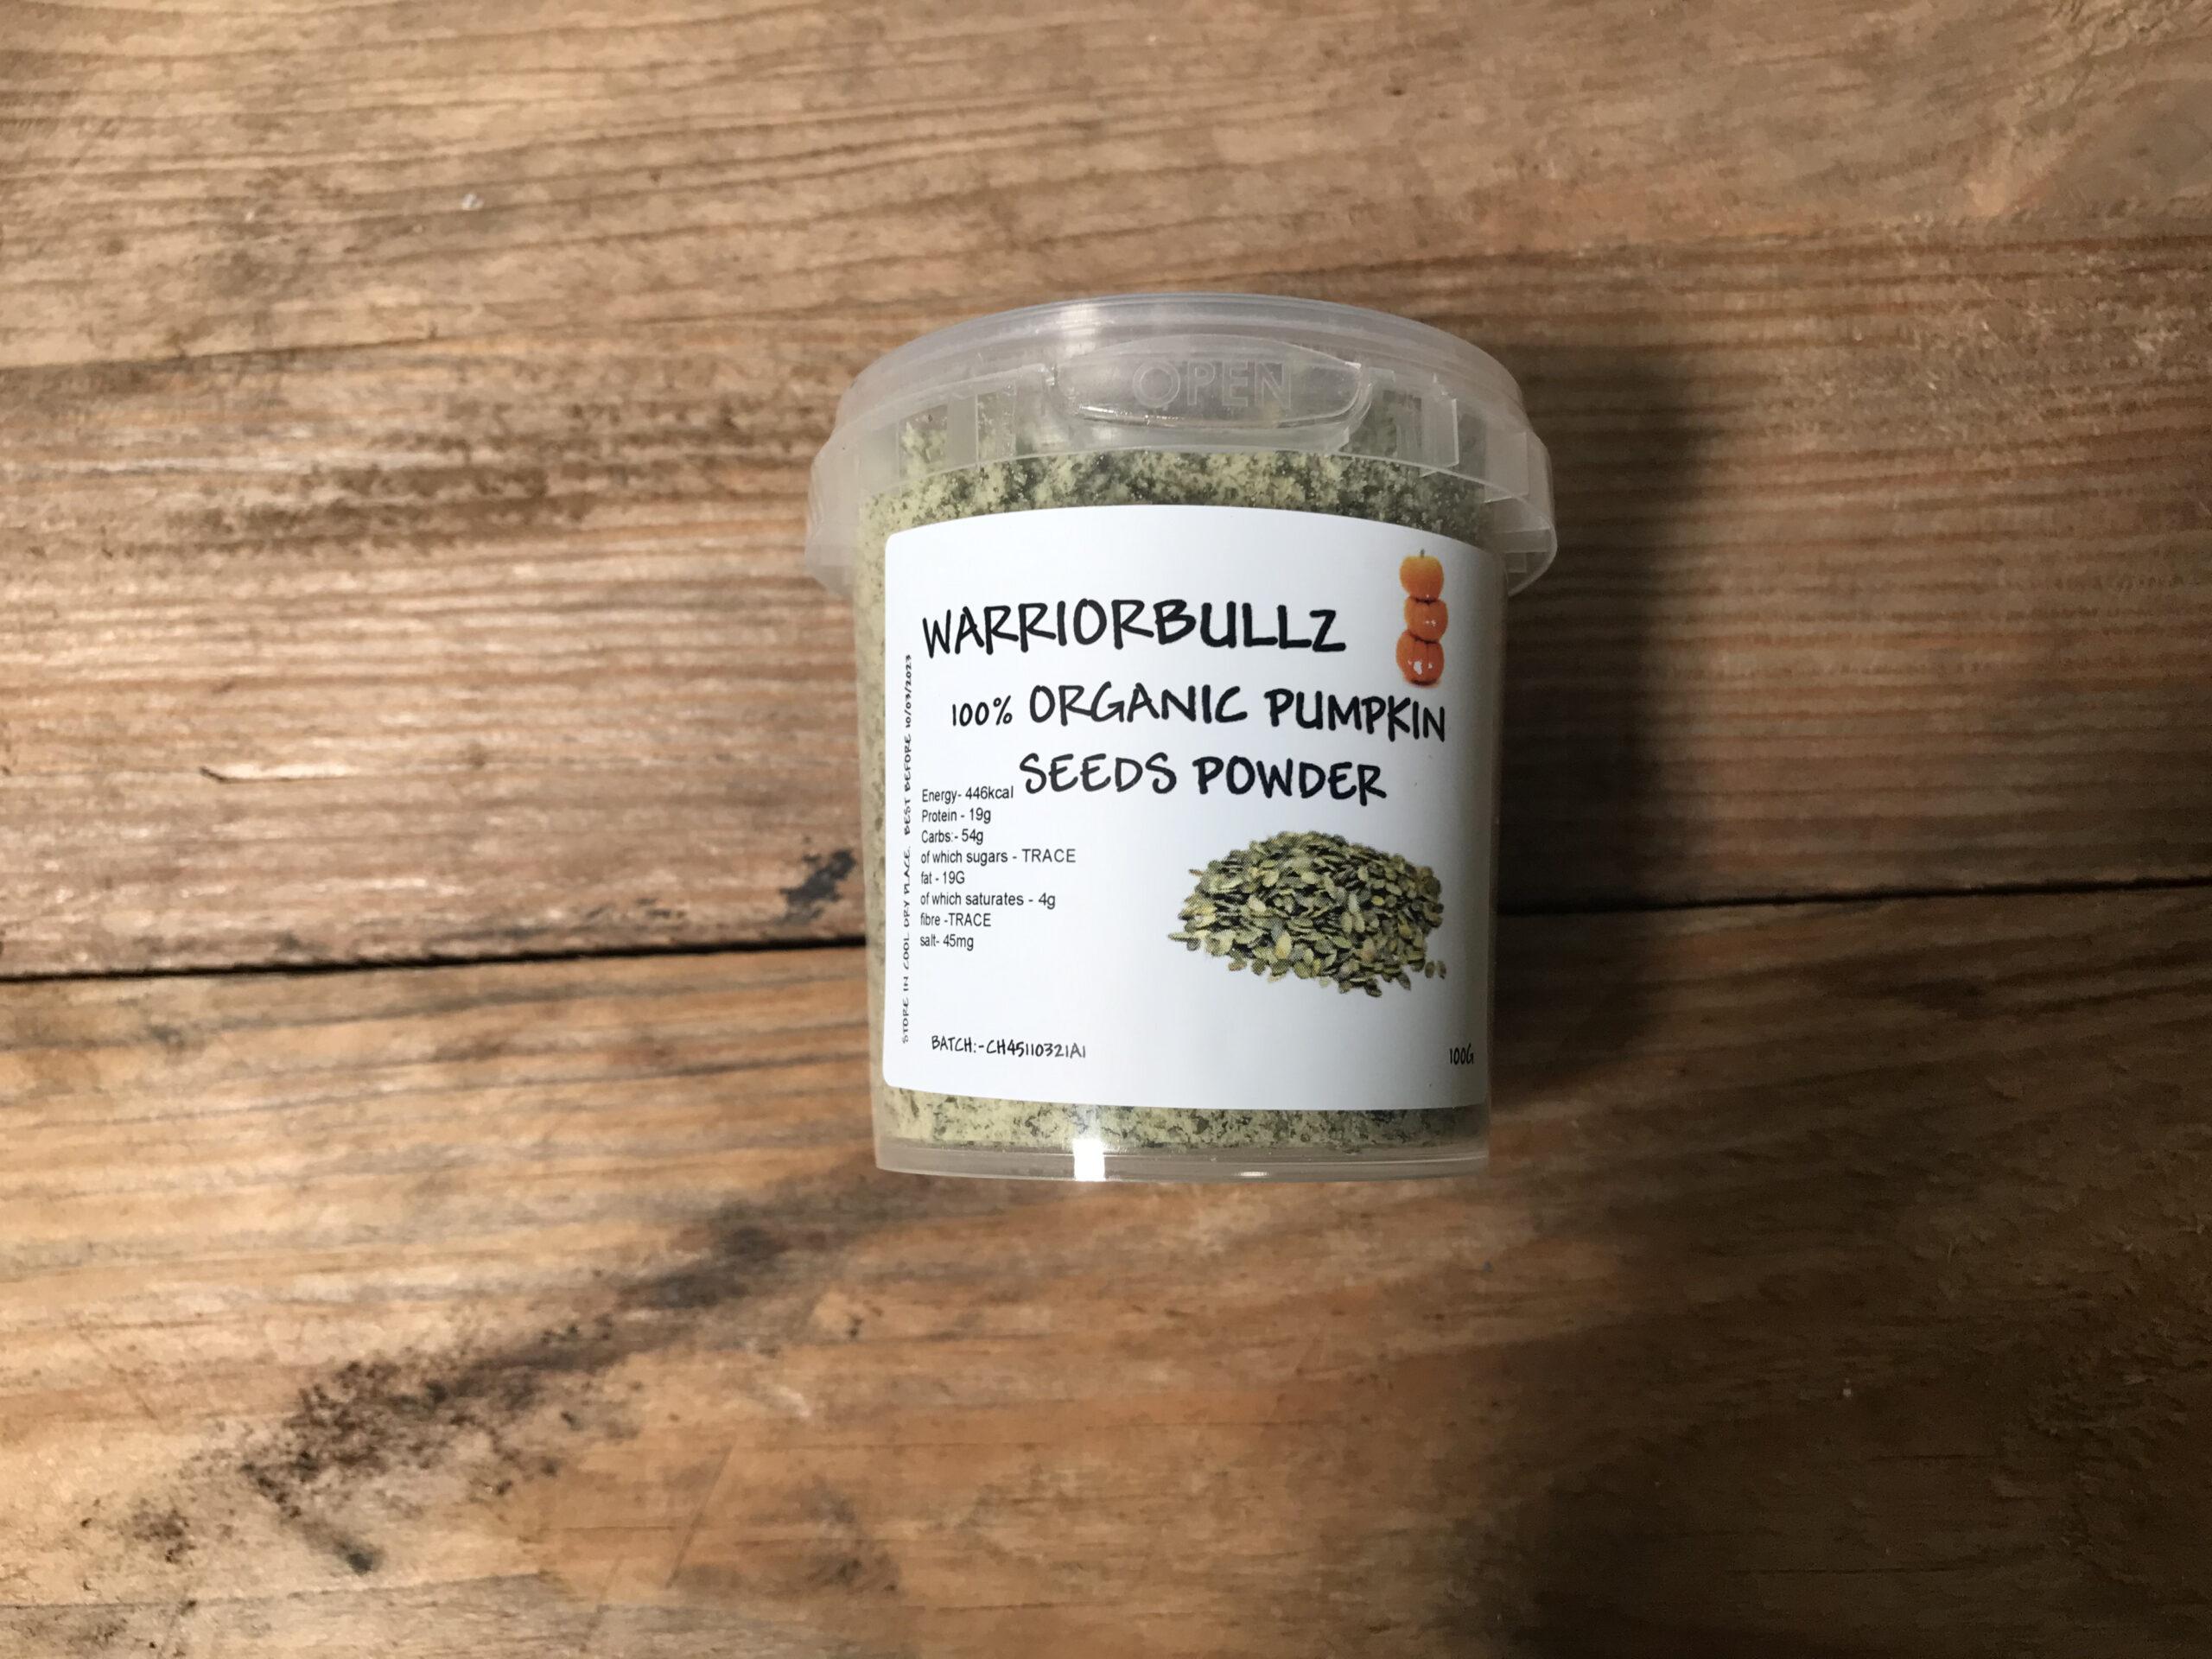 Warriorbullz Organic Pumpkin Seed Powder